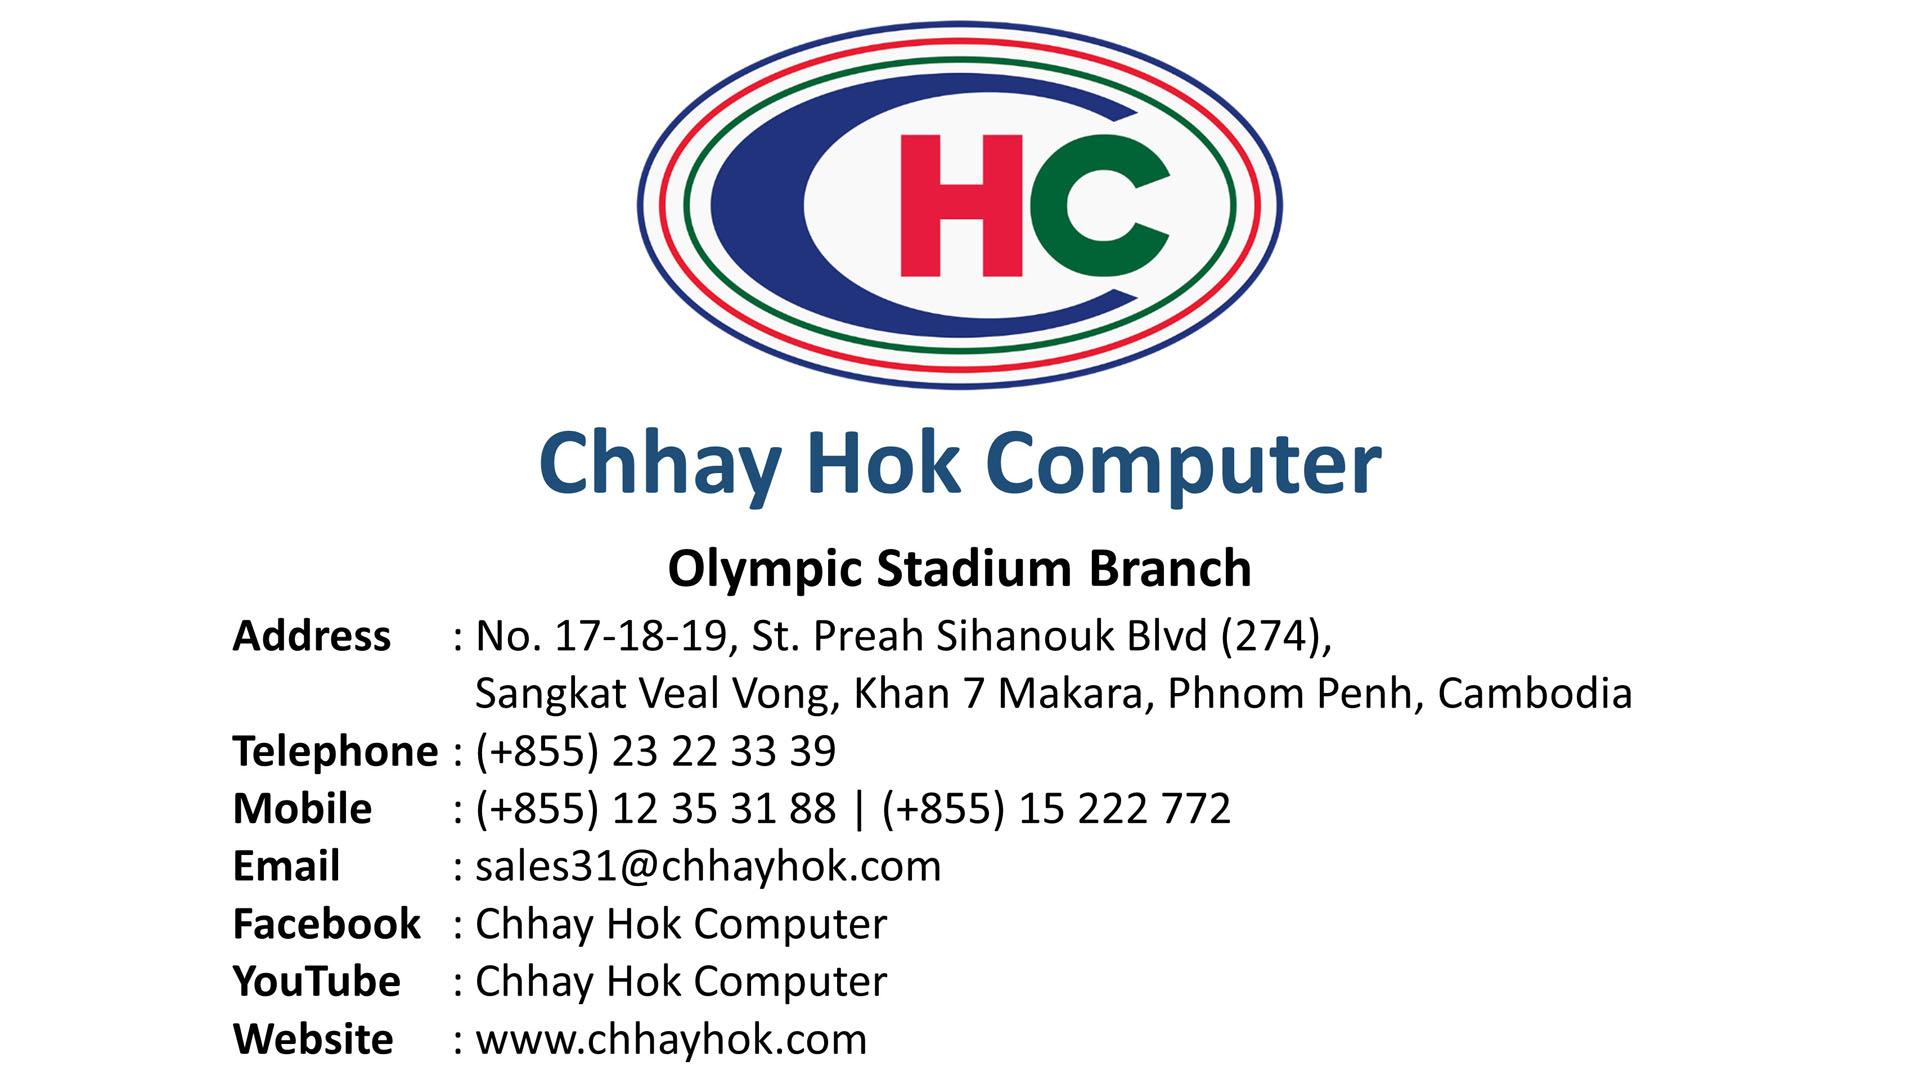 Chhay Hok, Olympic Stadium Branch